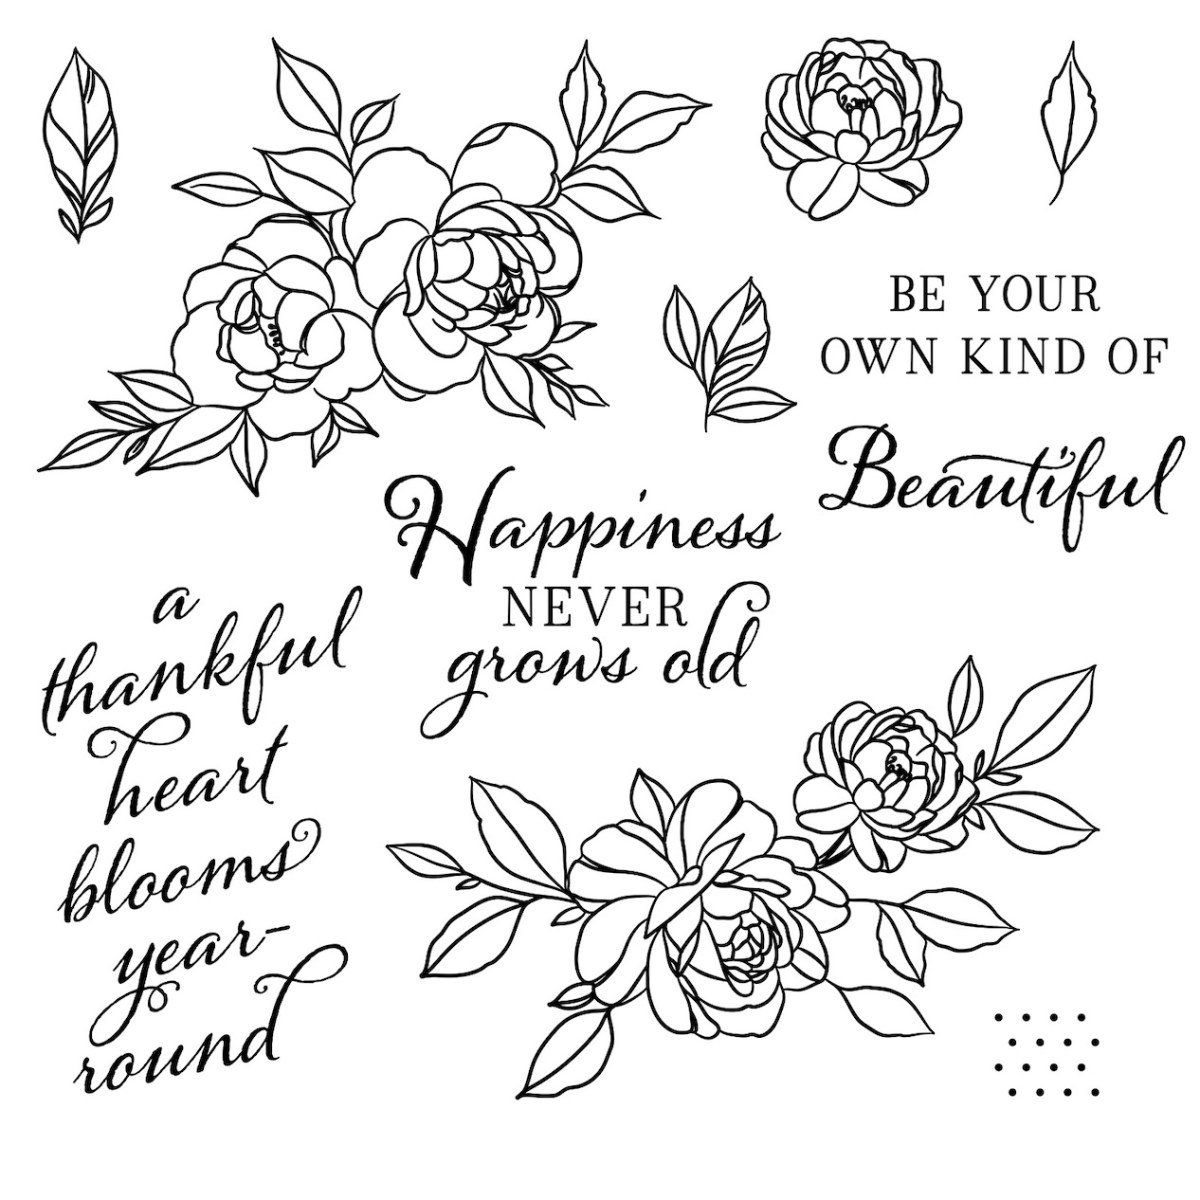 Close To My Heart VIP #closetomyheart #ctmh #scrapbooking #cardmaking #stamping #ctmhvip #vipprogram #happinessnevergrowsold #stampofthemonth #floralstampset #flowerstampset #beyourownkindofbeautiful #thankfulheart